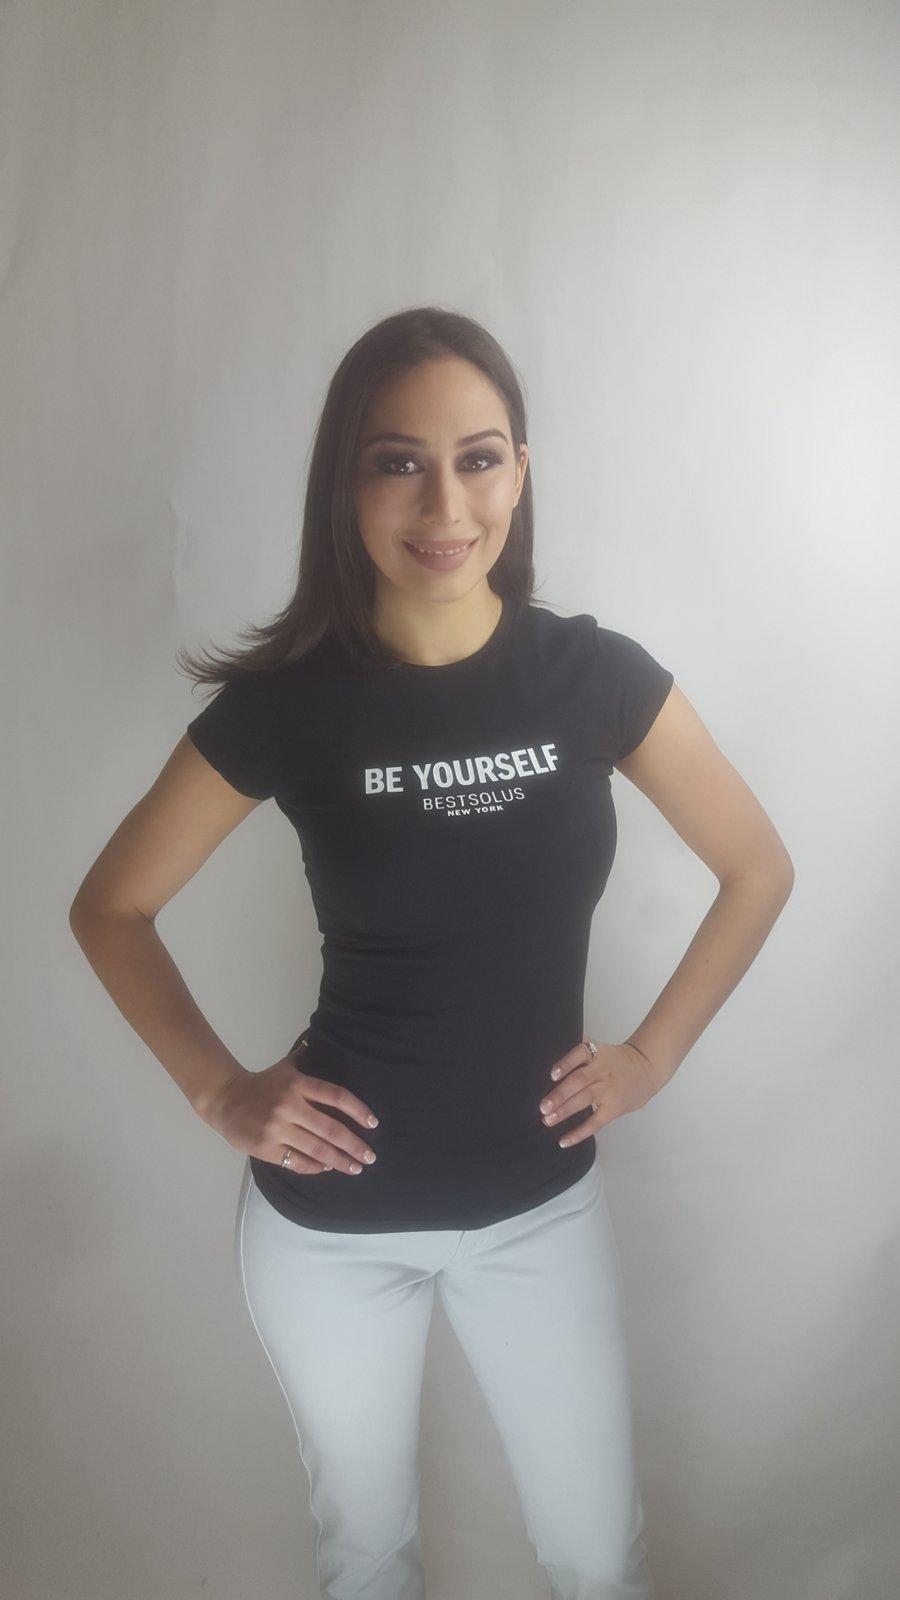 Image of BestSolus New York T Shirts